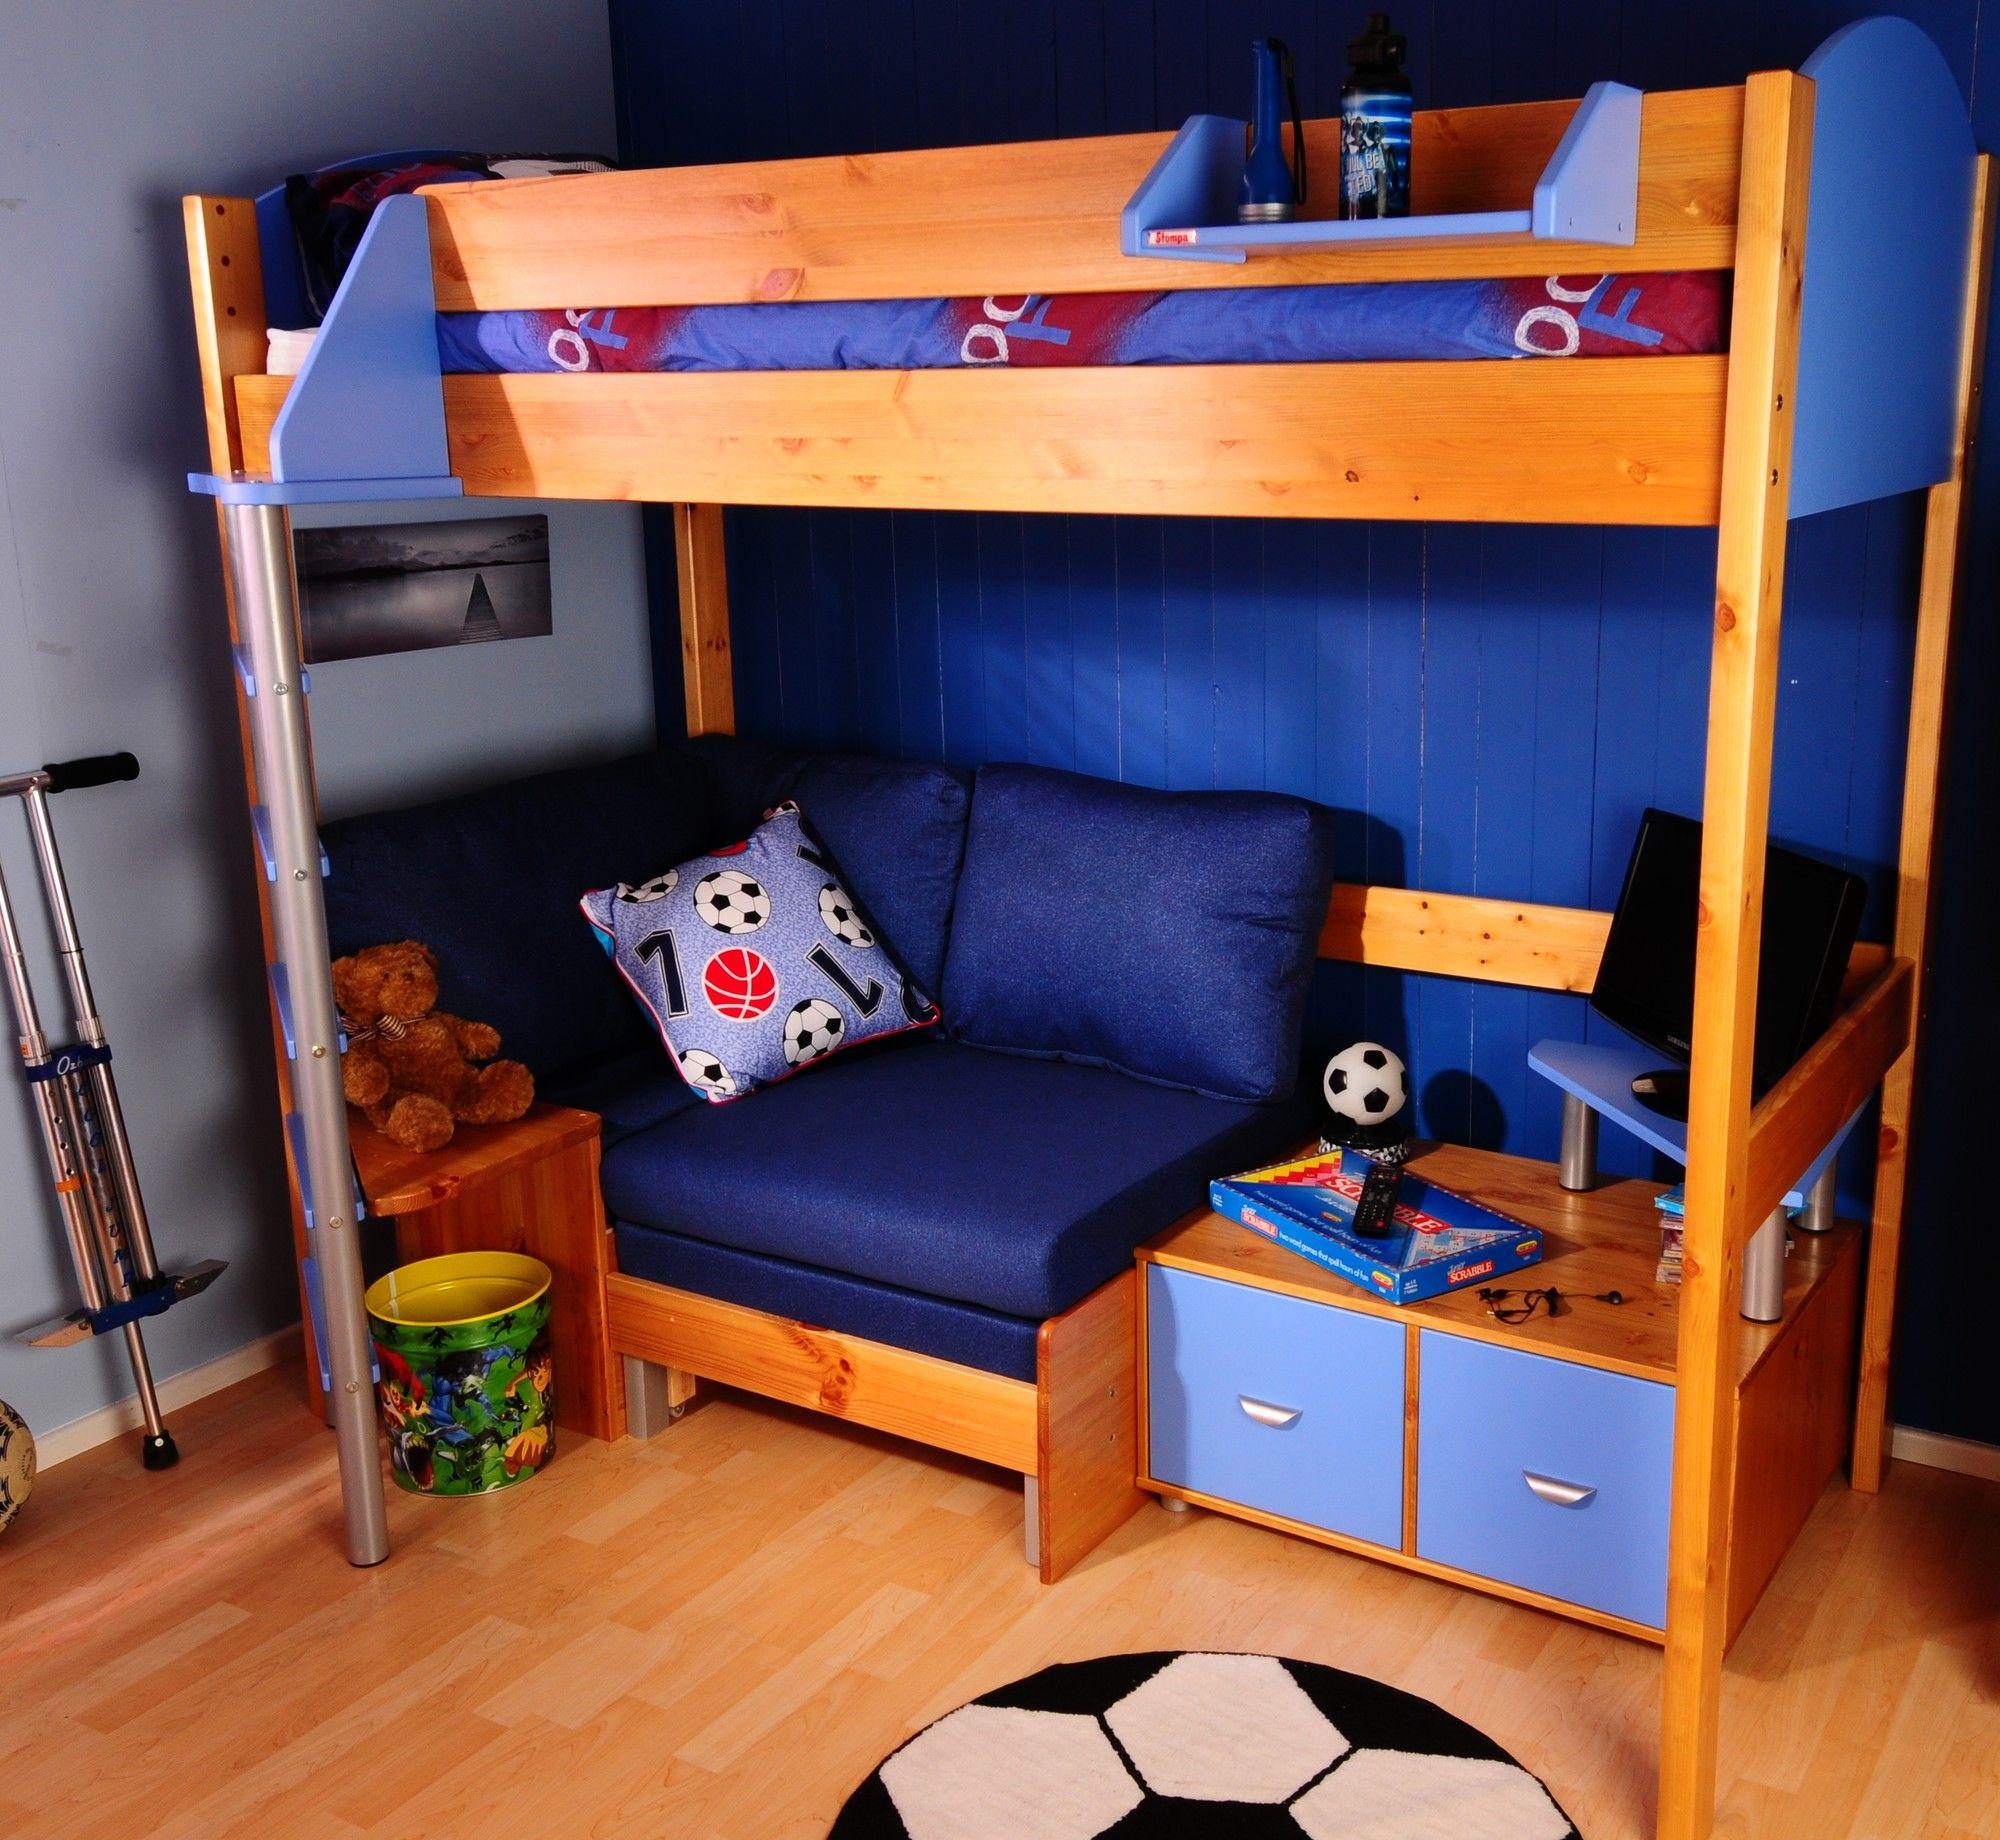 Peachy Stompa Casa High Sleeper Bunk Bed Reviews Wayfair Uk Camellatalisay Diy Chair Ideas Camellatalisaycom